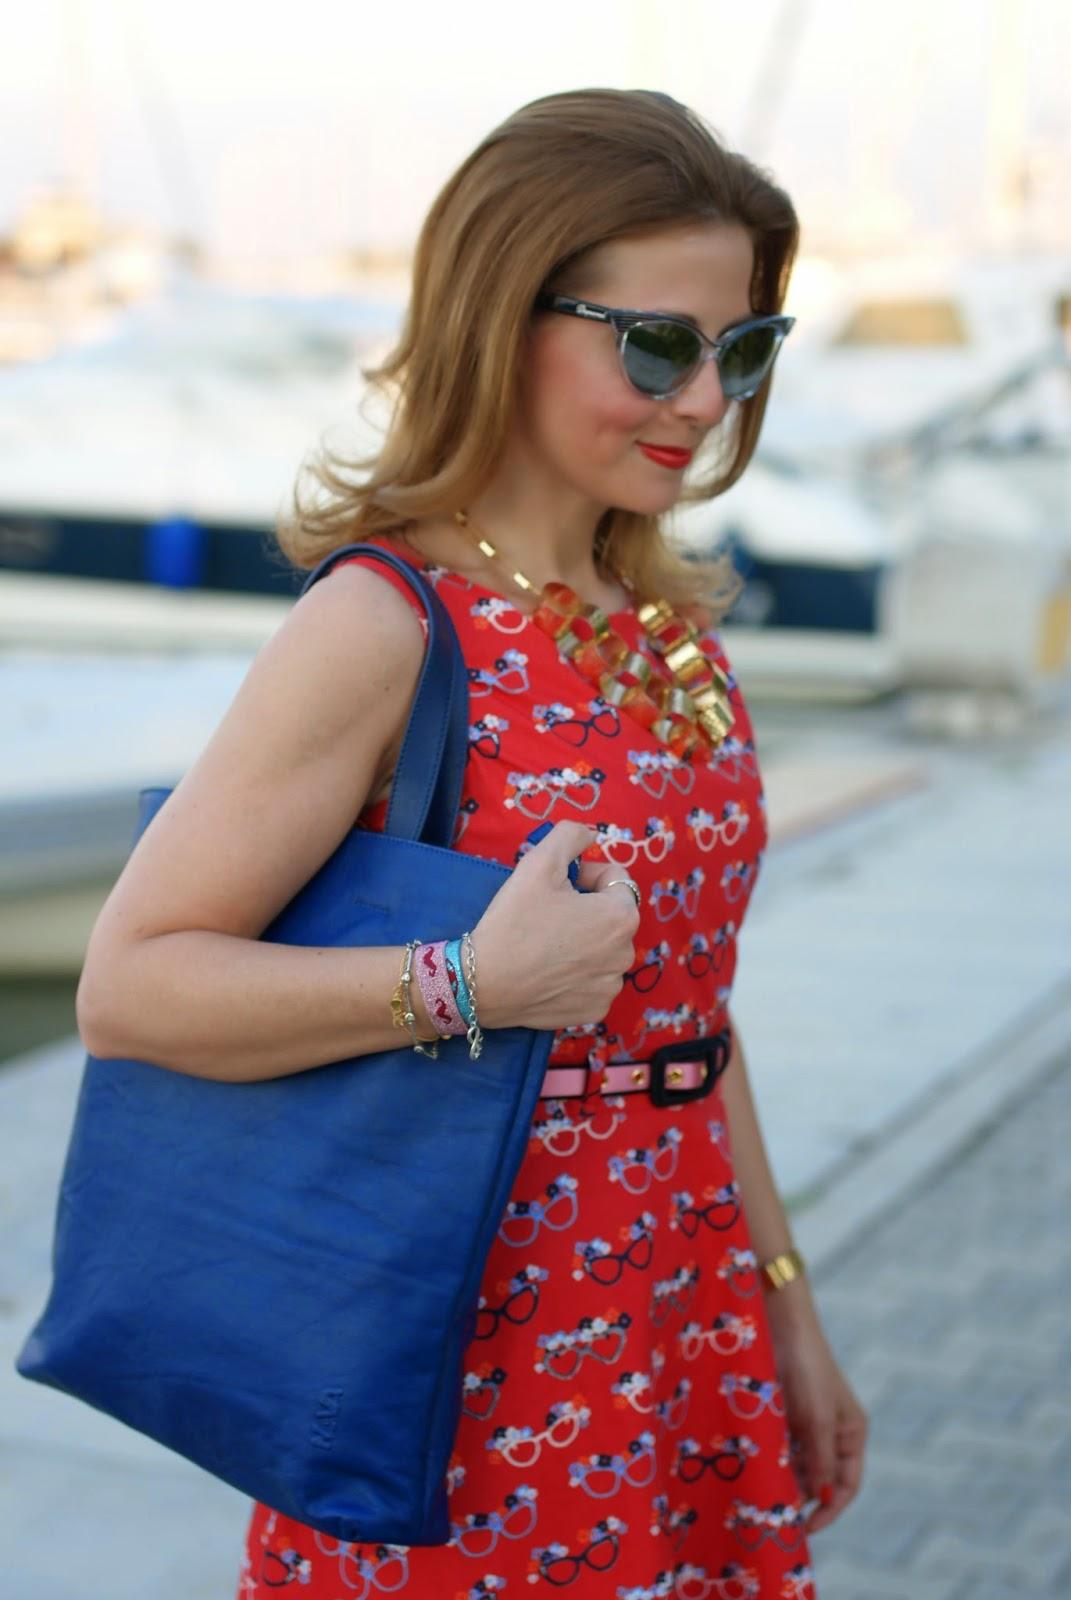 Vitti Ferria Contin collana dorata, nava design shopper bag, yumi glasses print dress, Fashion and Cookies, fashion blogger